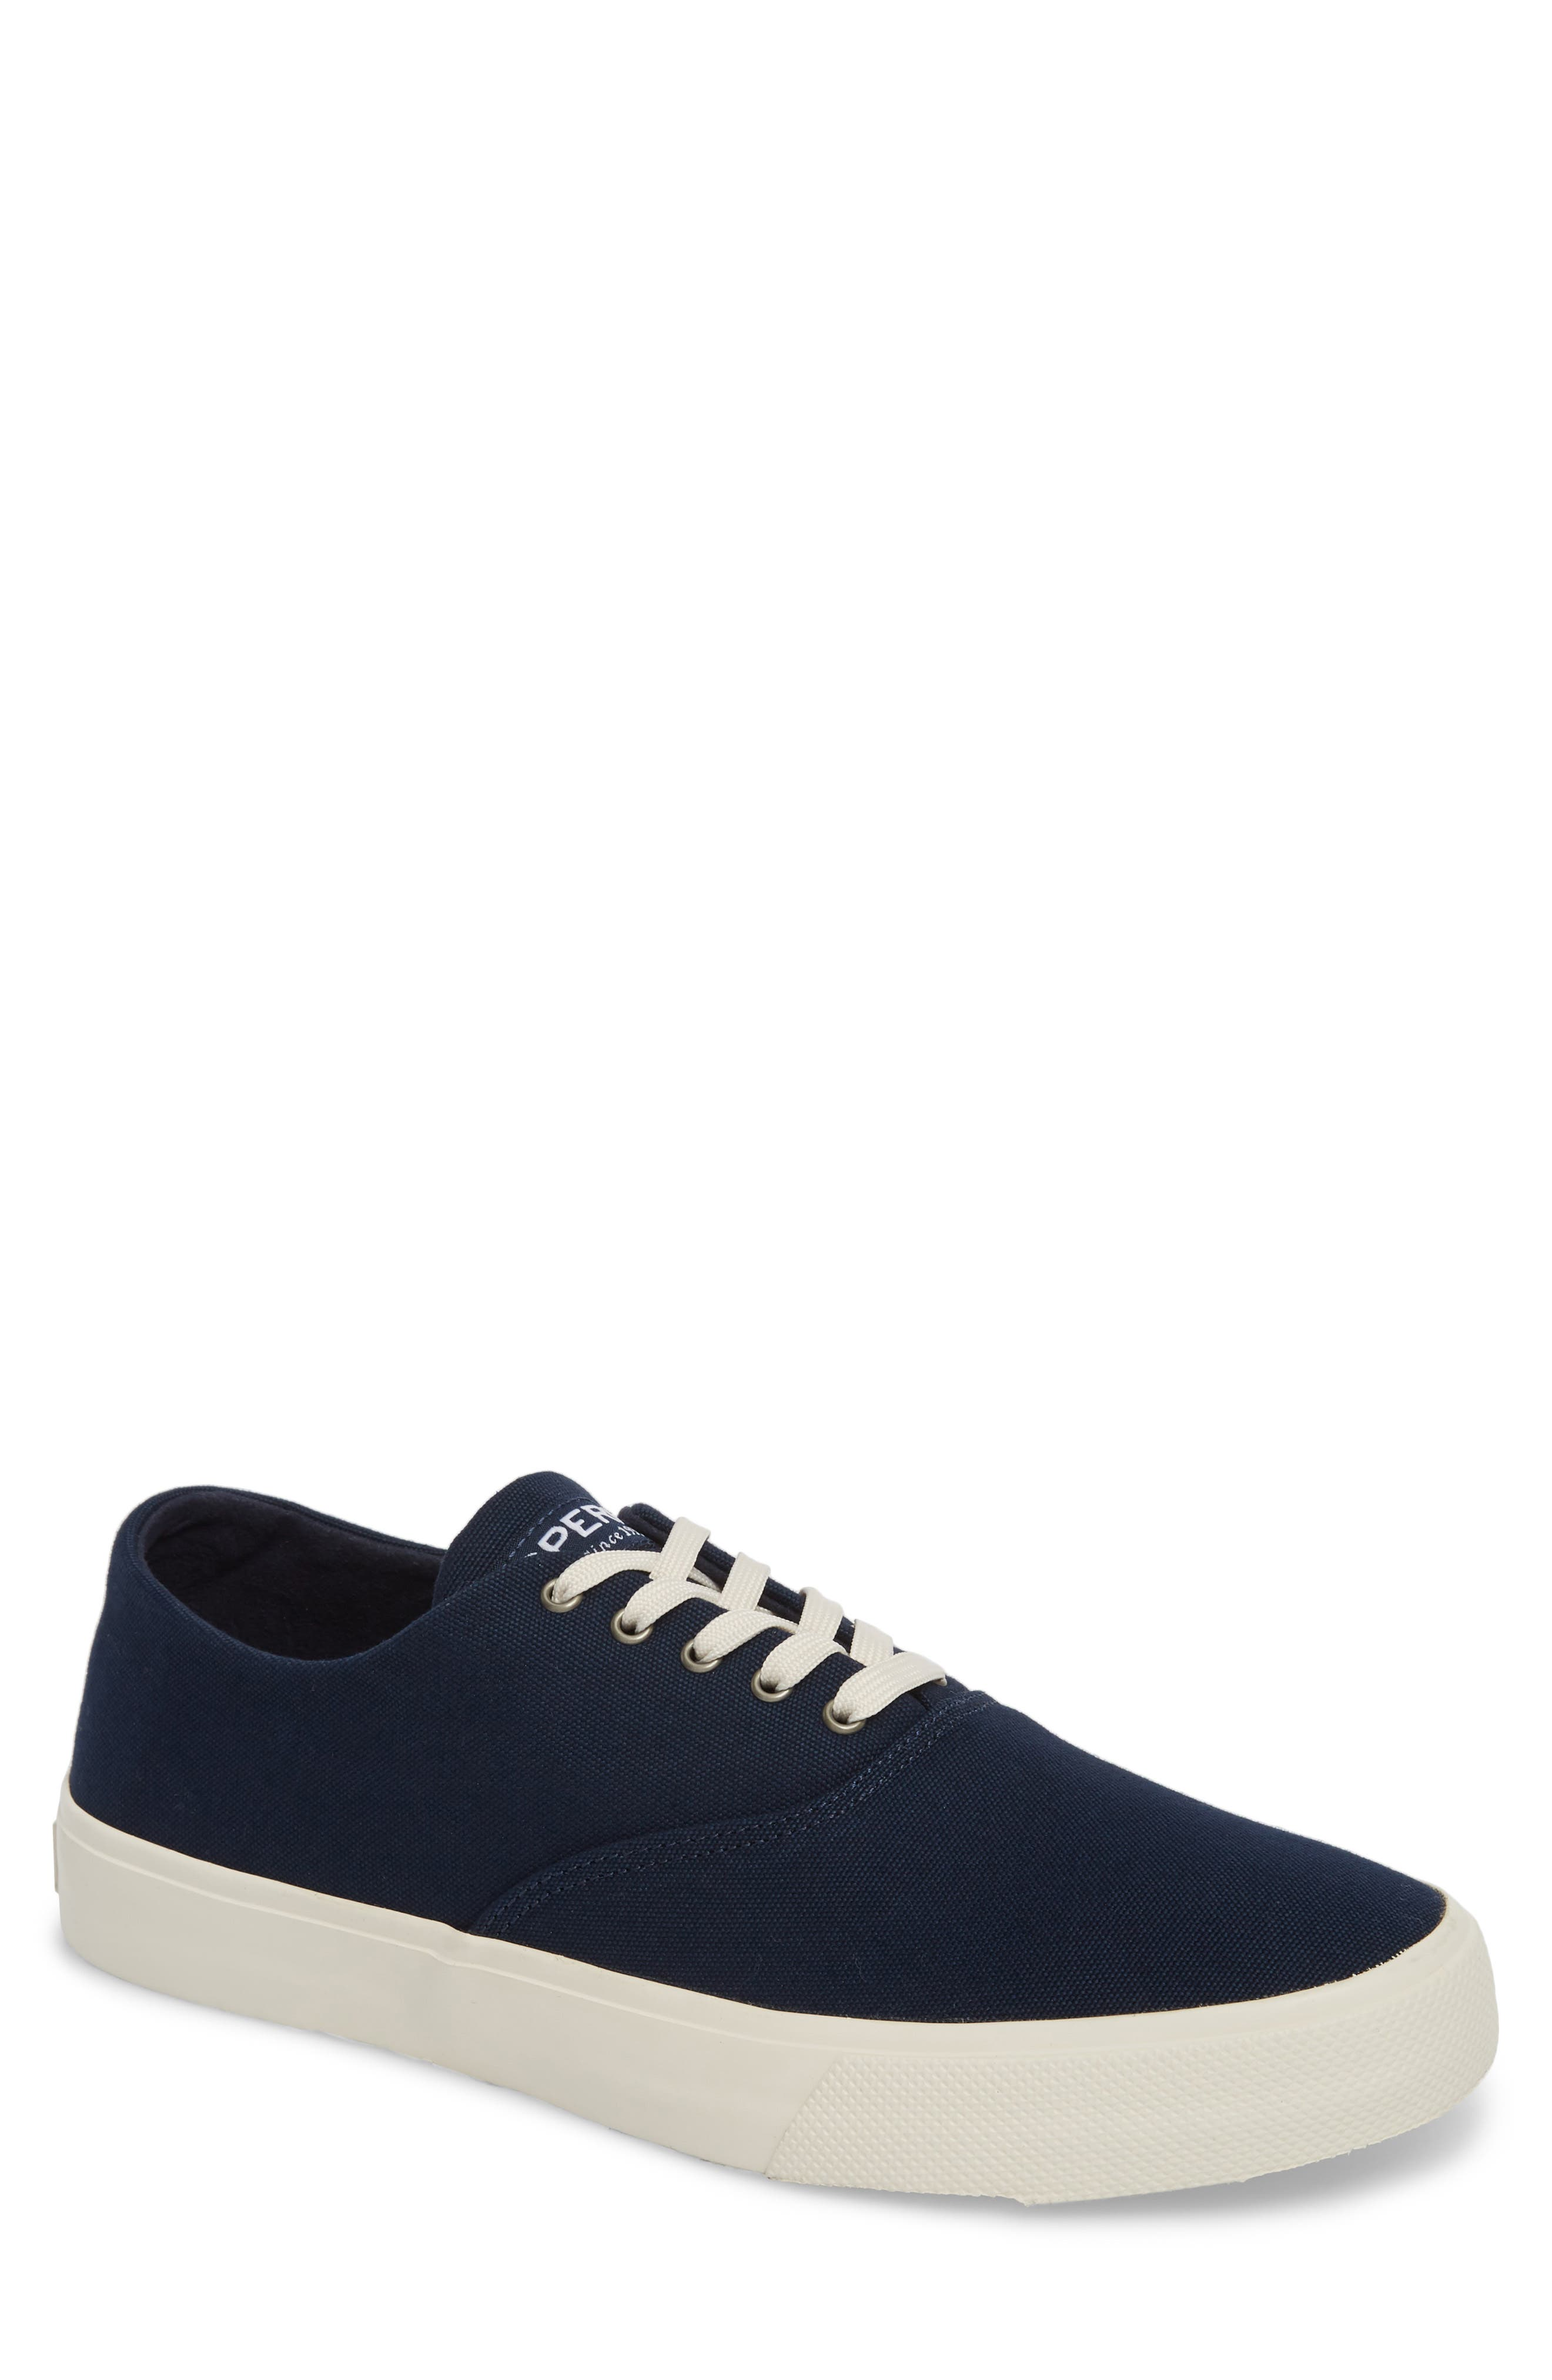 Sperry Captain's CVO Sneaker (Men's Shoes)